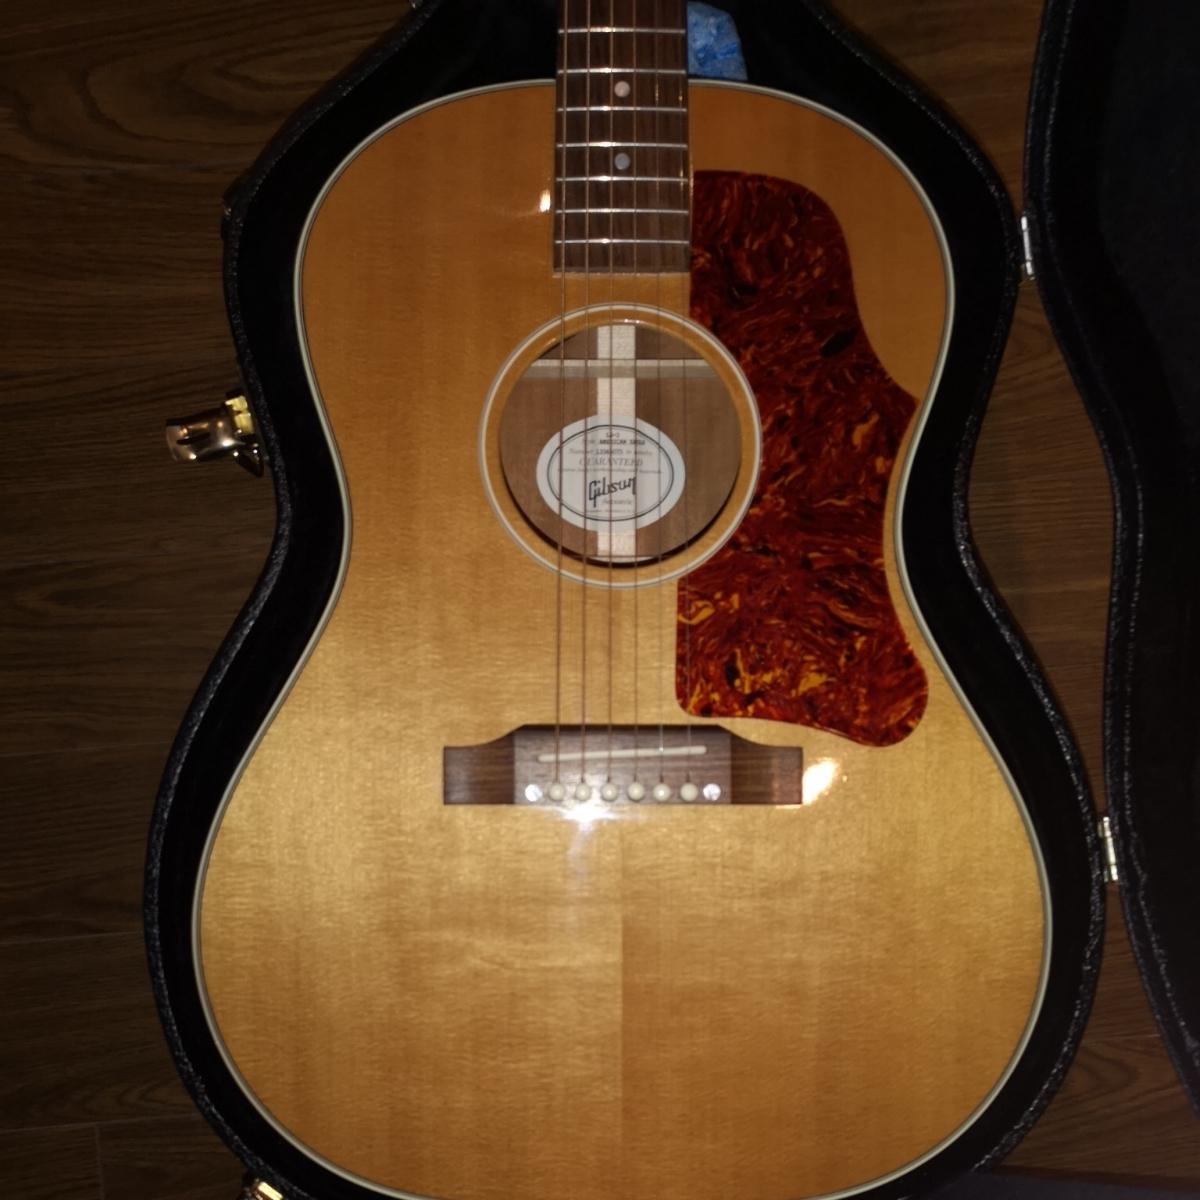 Gibson LG-2 American Eagle _画像2